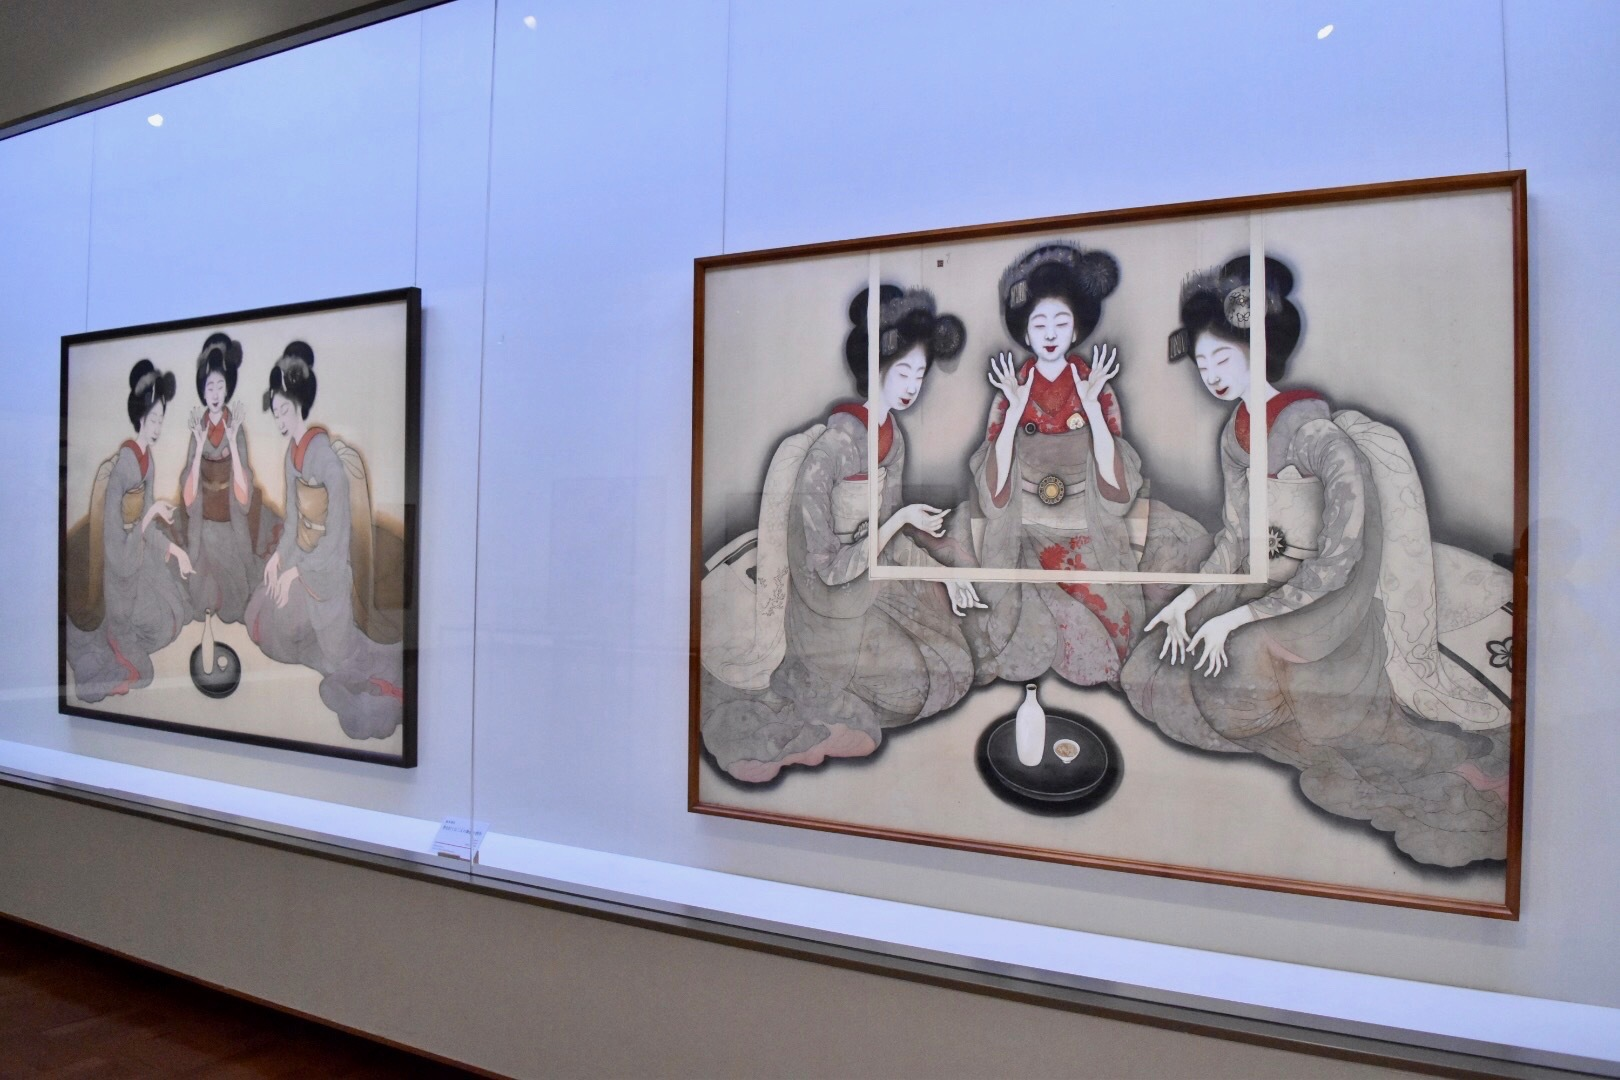 左:岡本神草《拳を打てる三人の舞妓(未成)》大正8年(1919)京都国立近代美術館 右:岡本神草《拳を打てる三人の舞妓の習作》大正9年(1920)同館蔵